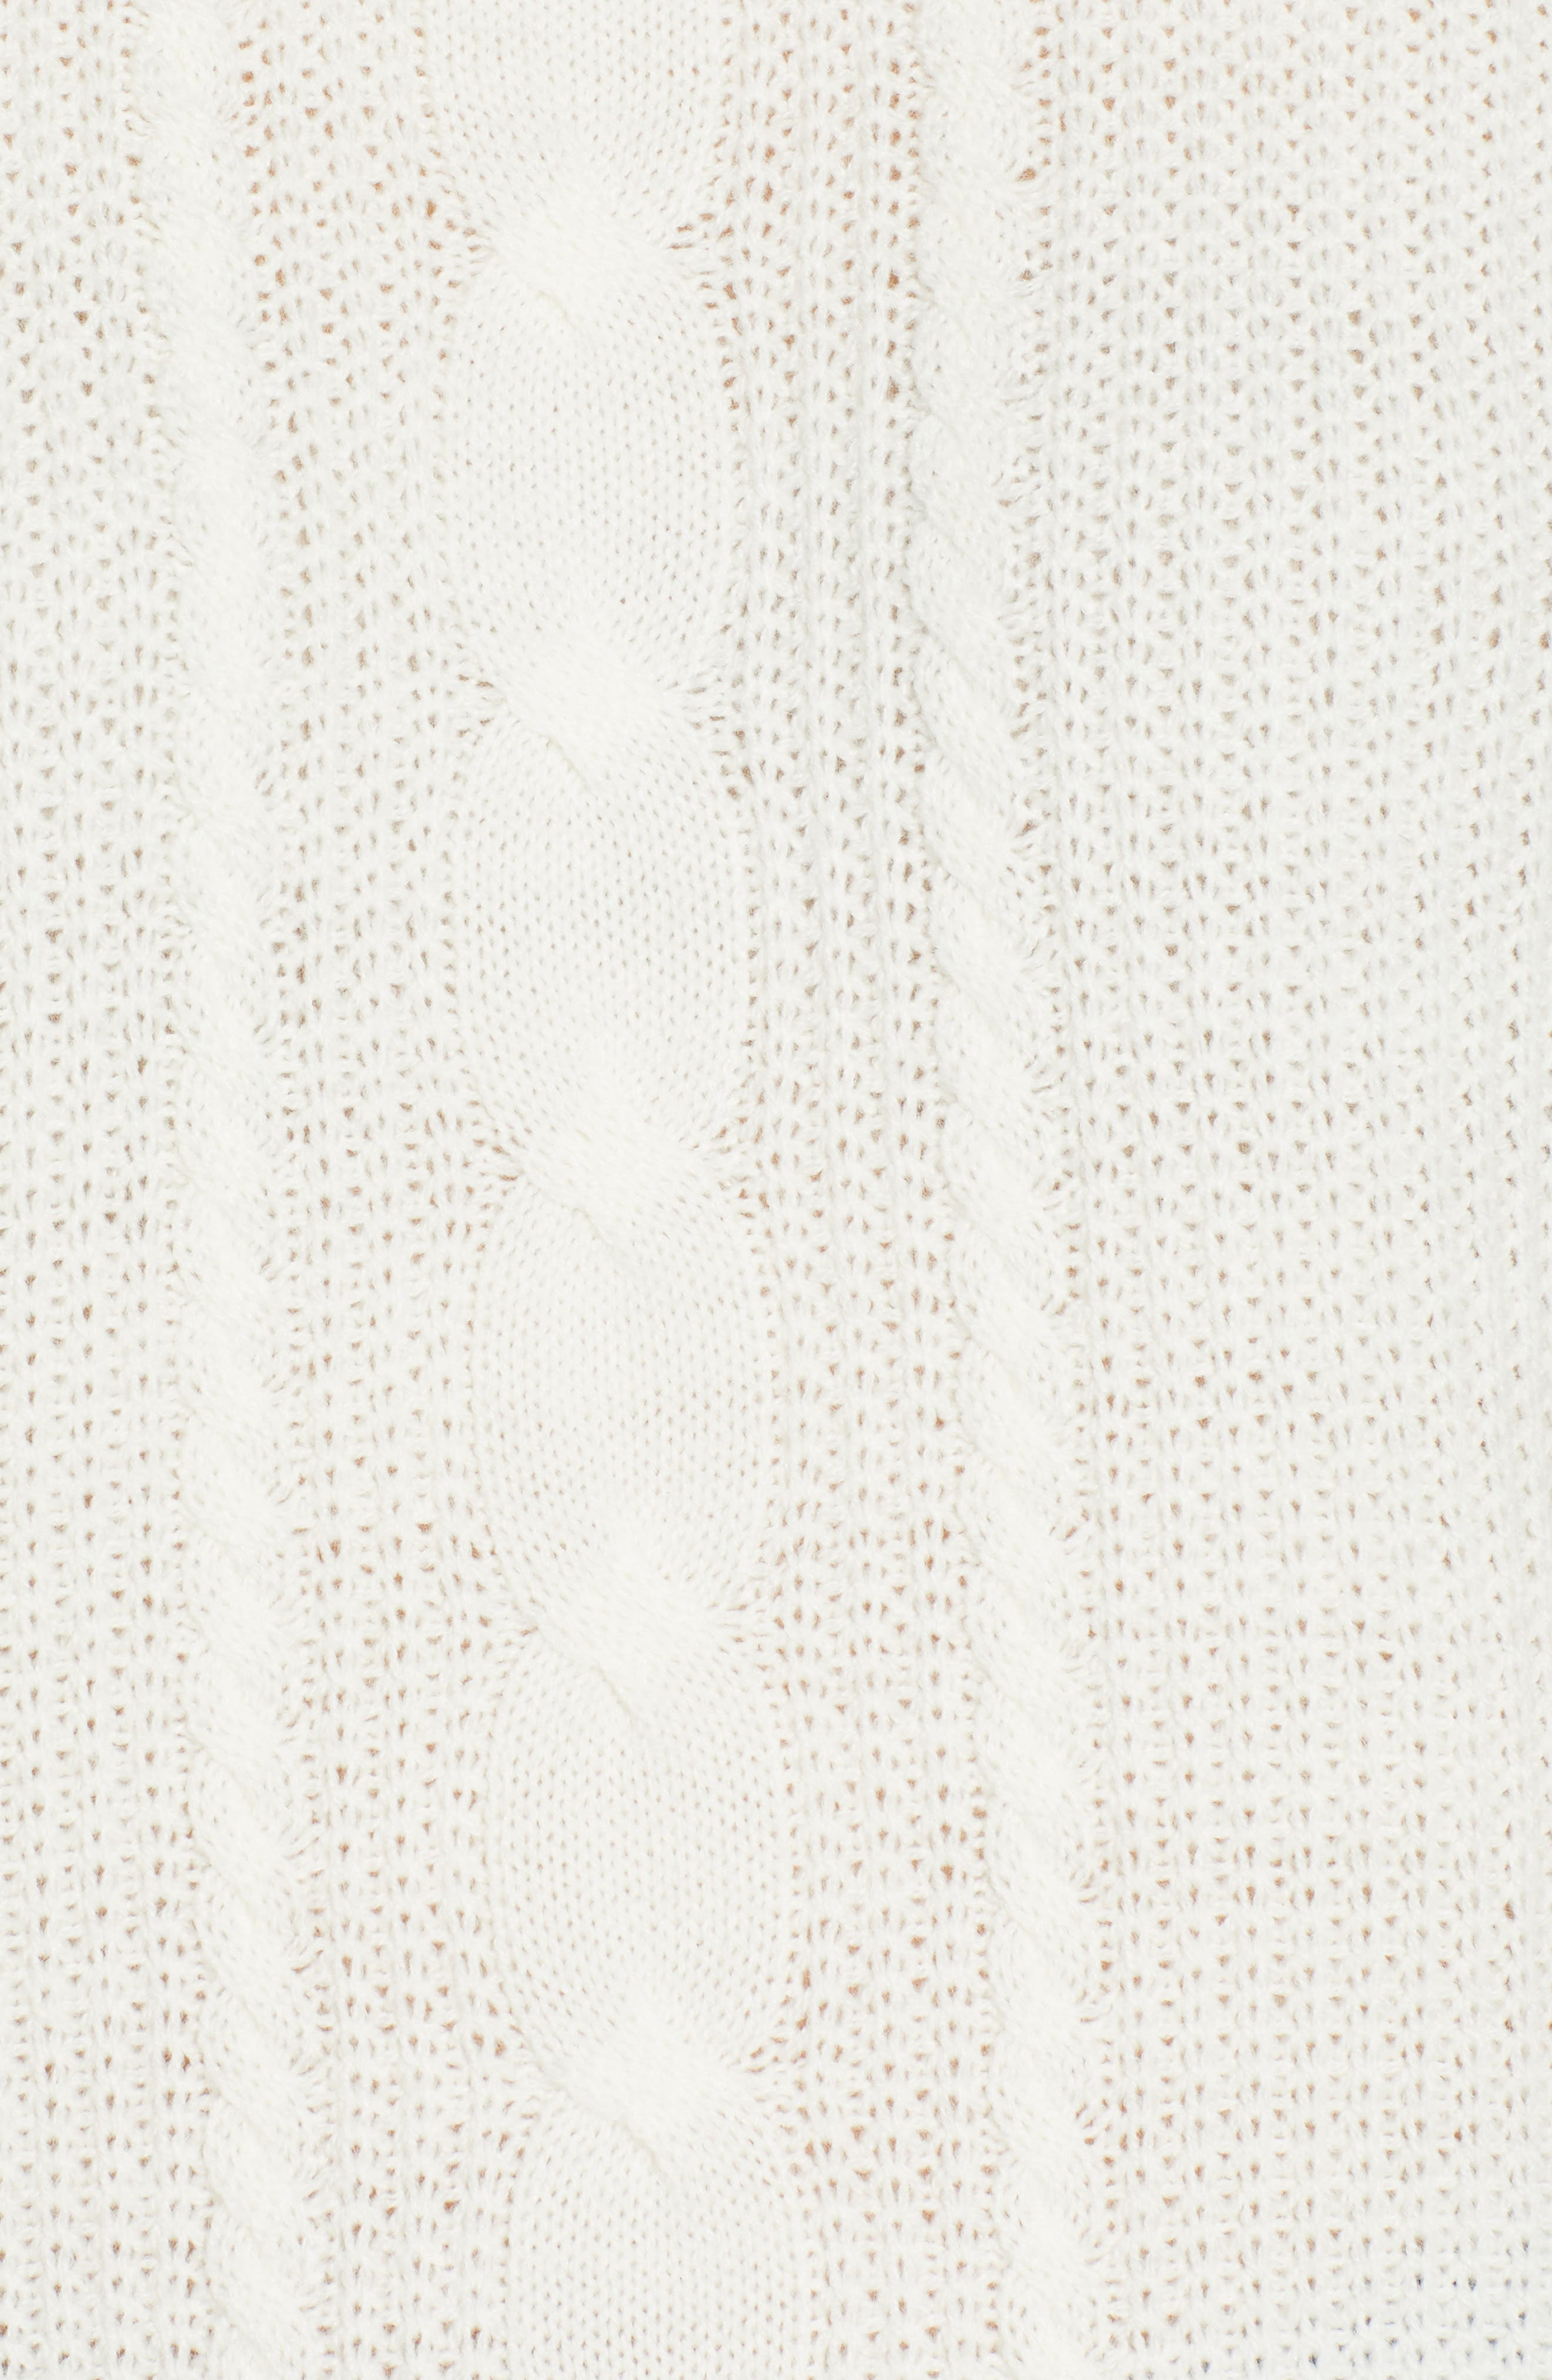 TJW Cable Knit Sweater,                             Alternate thumbnail 5, color,                             CLOUD DANCER